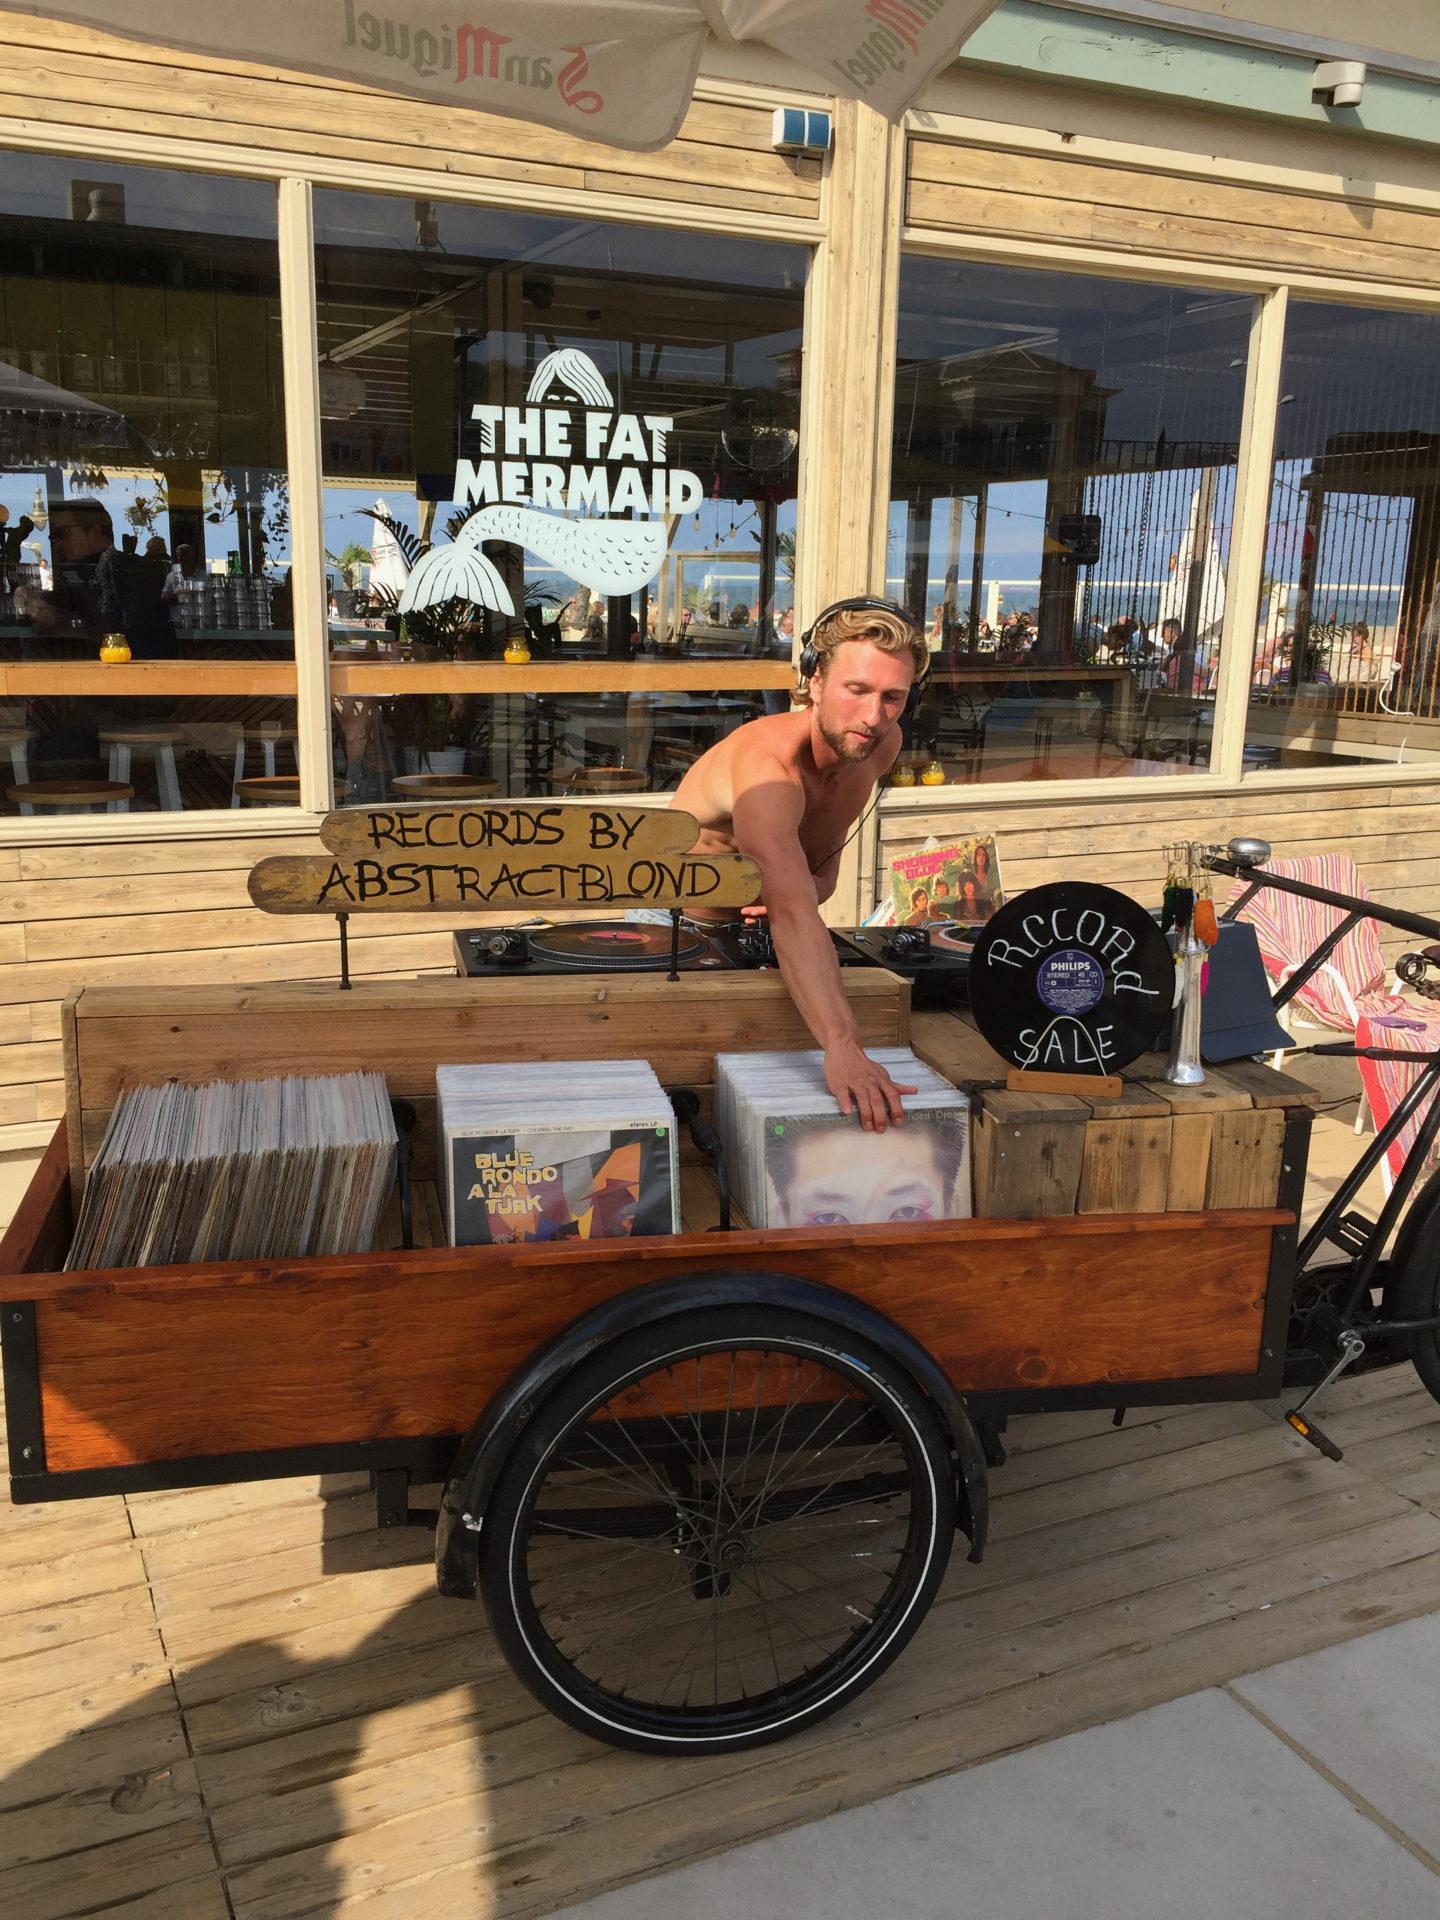 Schallplattenverkäufer vor einem Strandpavillon The Fat Mermaid in Den Haag